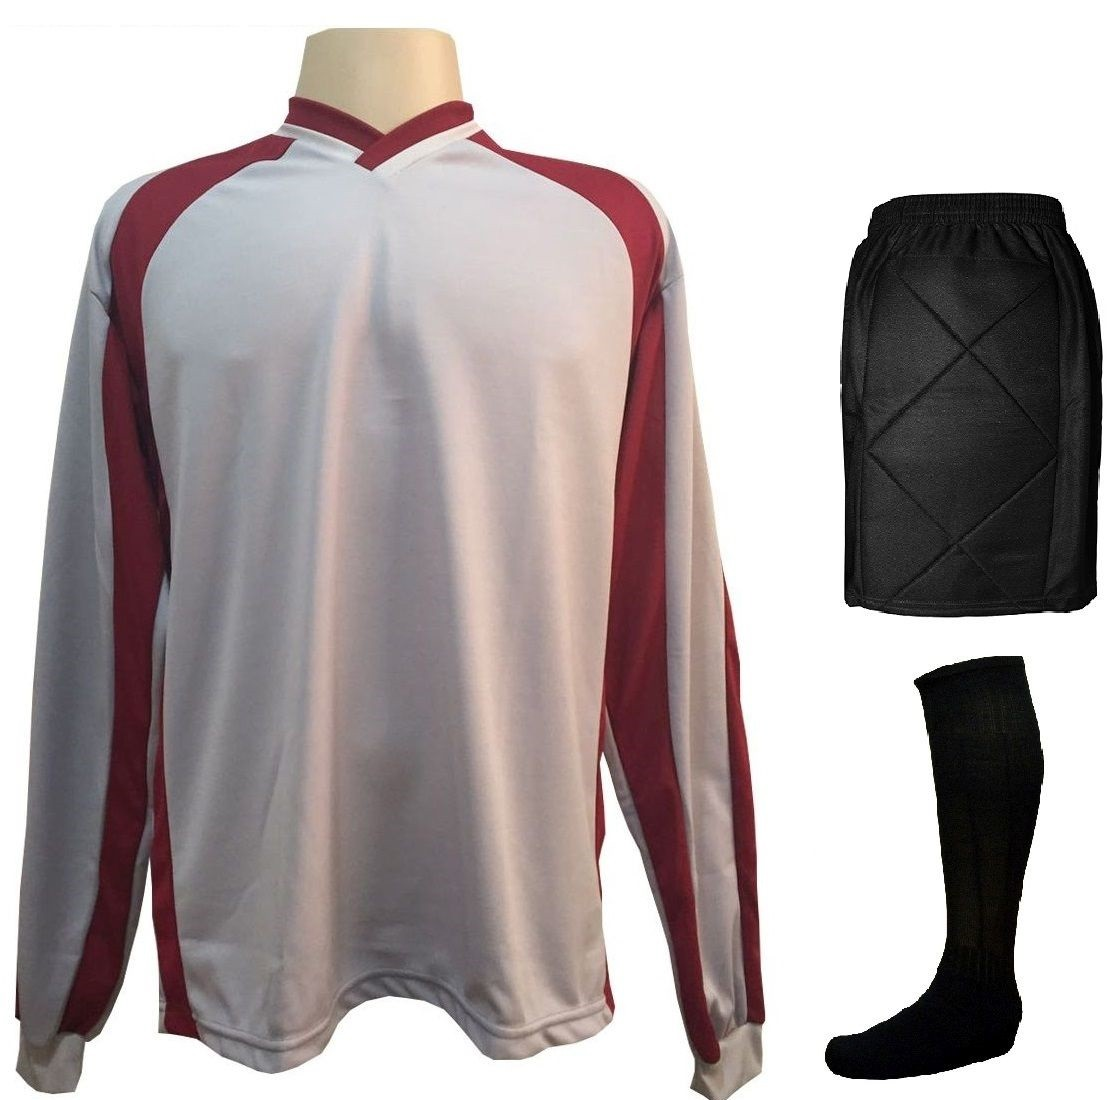 Uniforme Completo modelo Milan 18+2 (18 Camisas Royal/Branco + 18 Calções Royal/Branco + 18 Pares de Meiões Royal + 2 Conjuntos de Goleiro) + Brindes